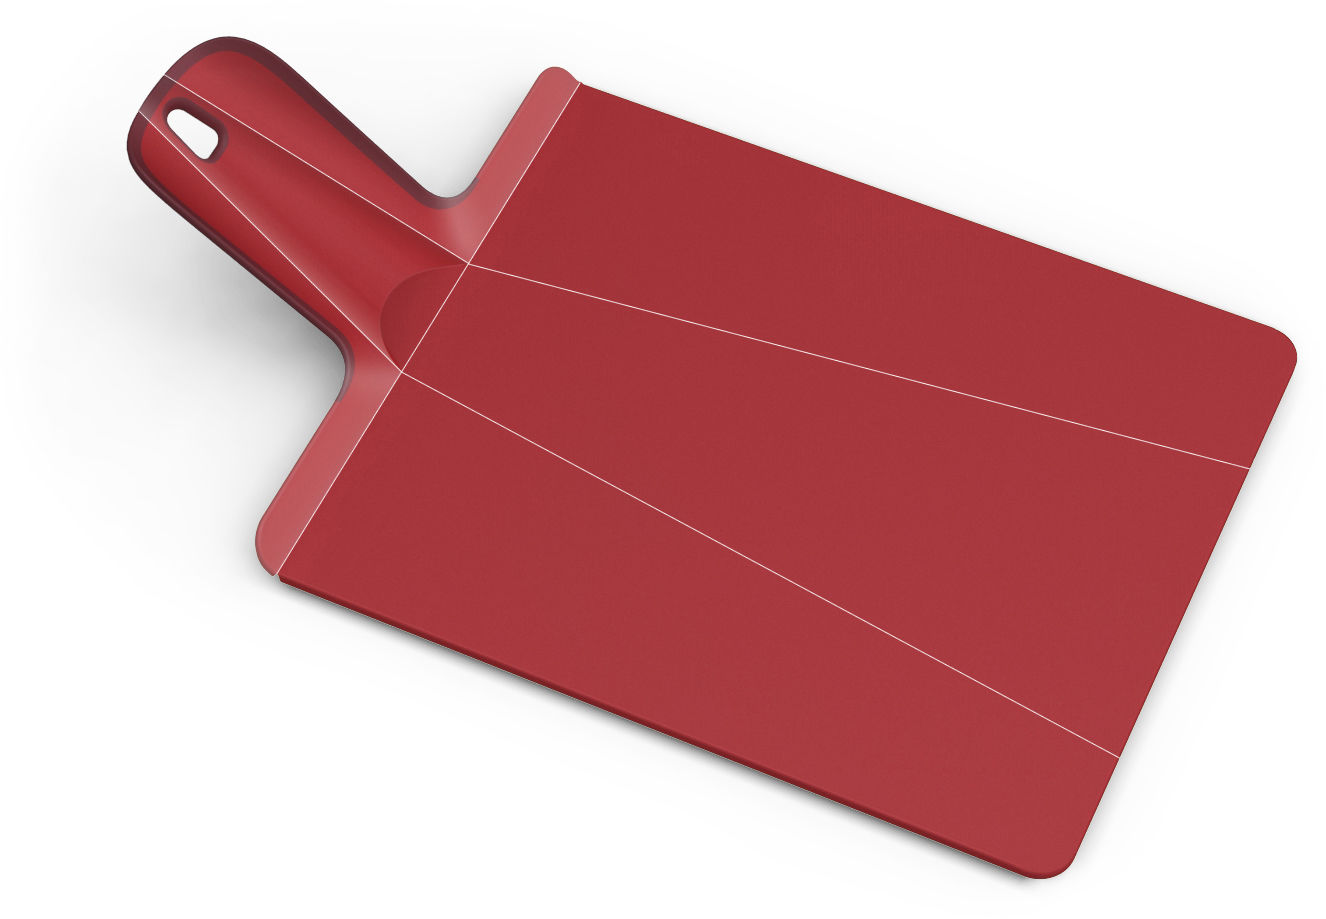 Küche - Einfach praktisch - Chop2Pot Schneidebrett zusammenklappbar - Joseph Joseph - Rot - Polypropylen